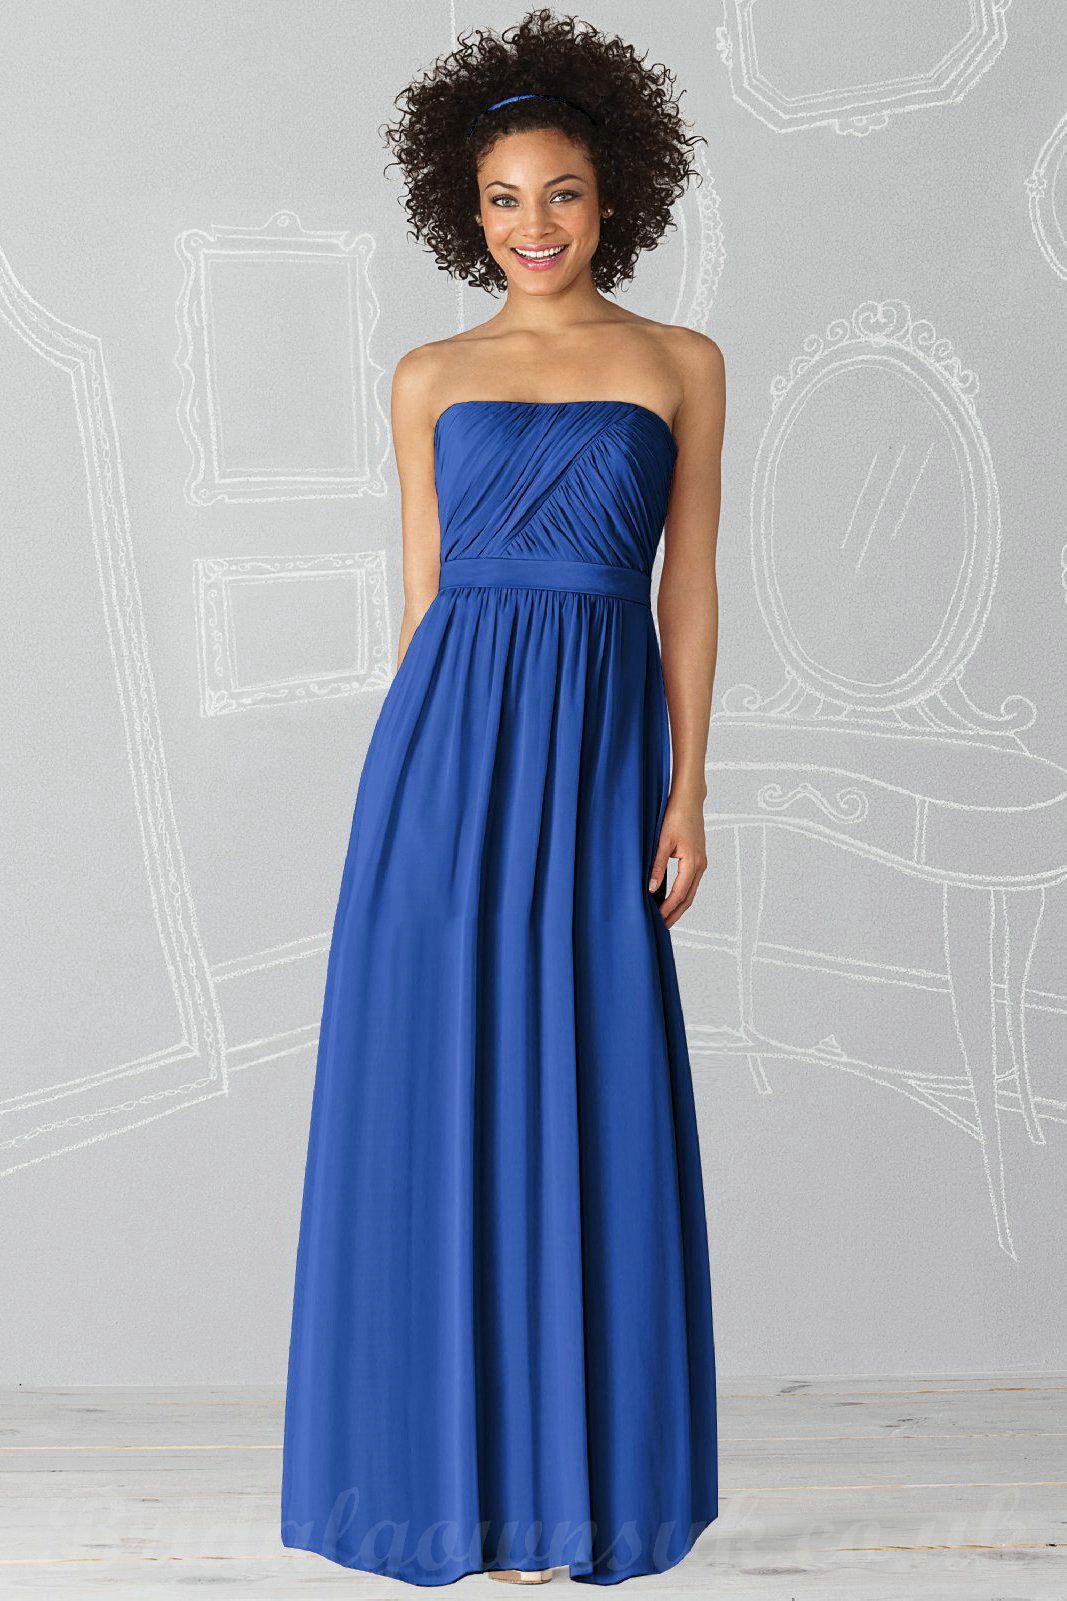 1000  images about Emmas Wedding on Pinterest - Cobalt blue- Royal ...